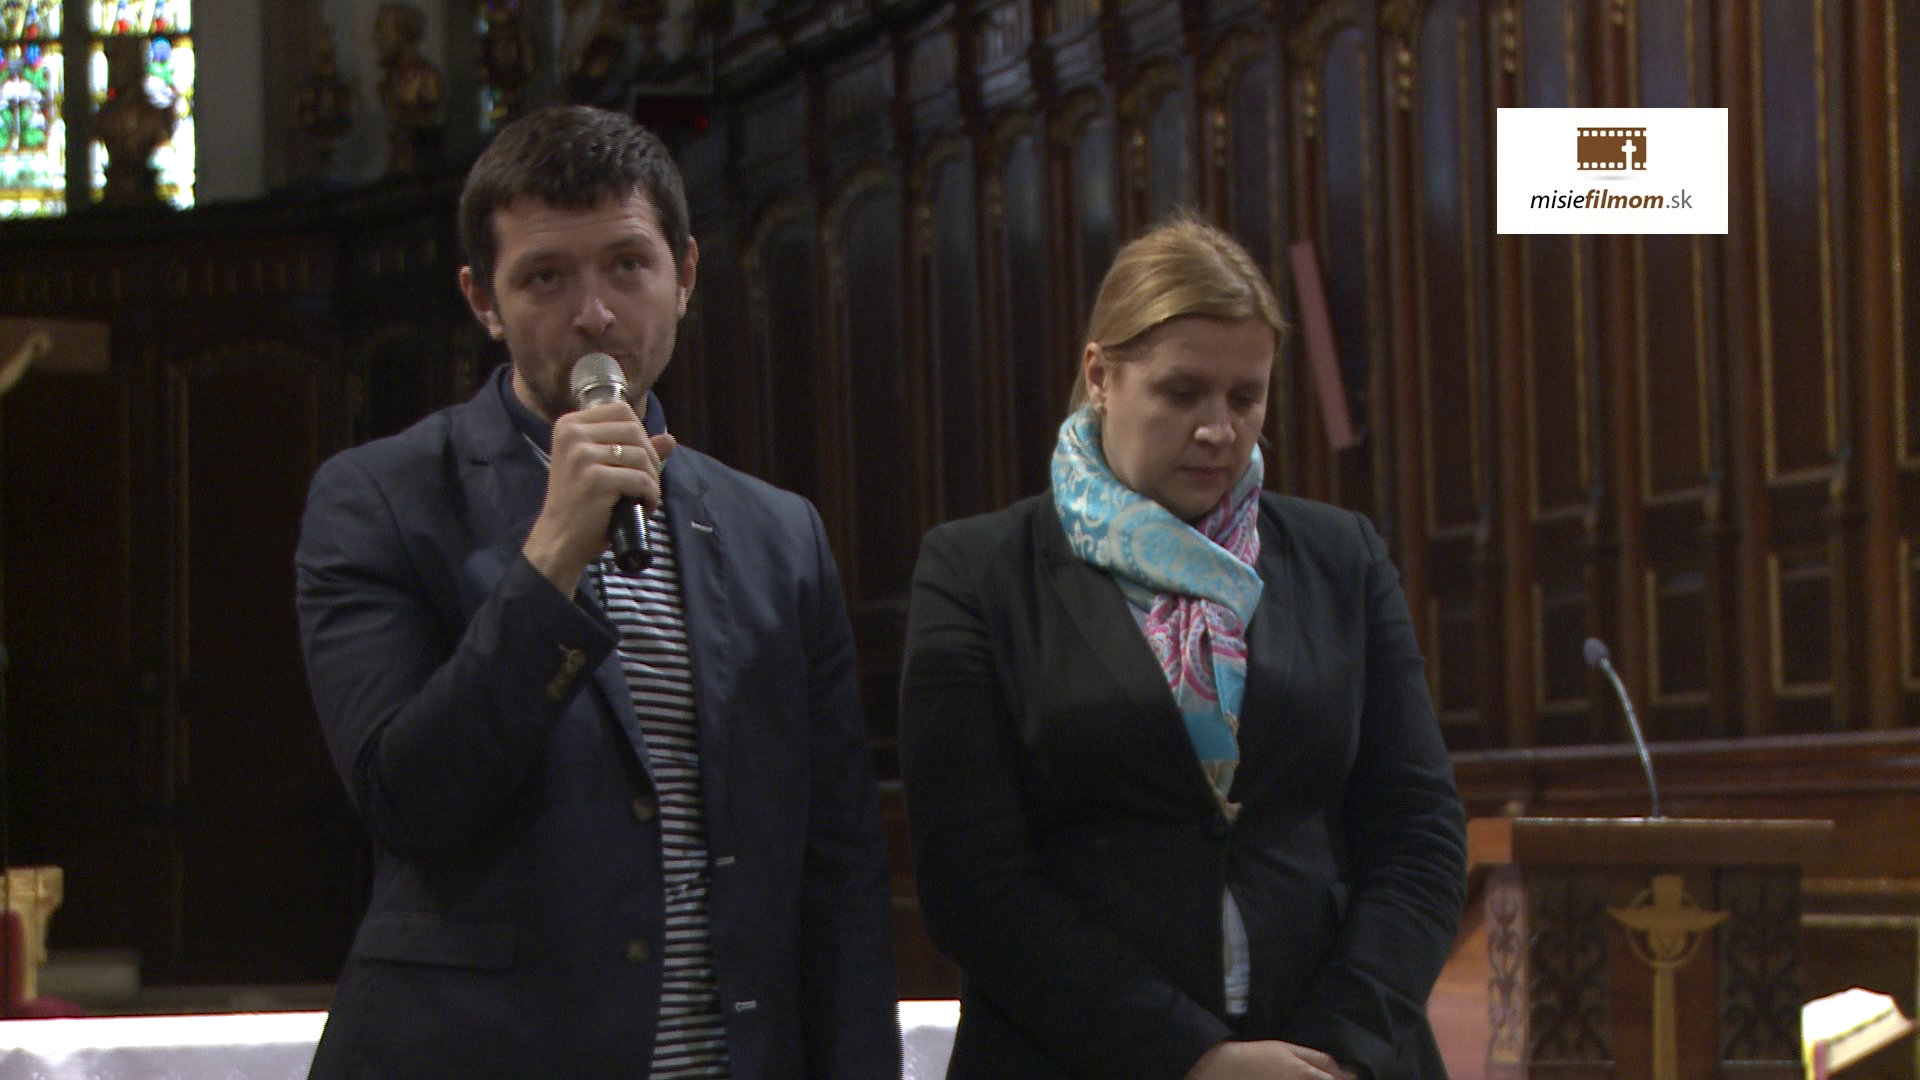 Štefan a Janka(komunita Emanuel): Naša cesta modlitbou